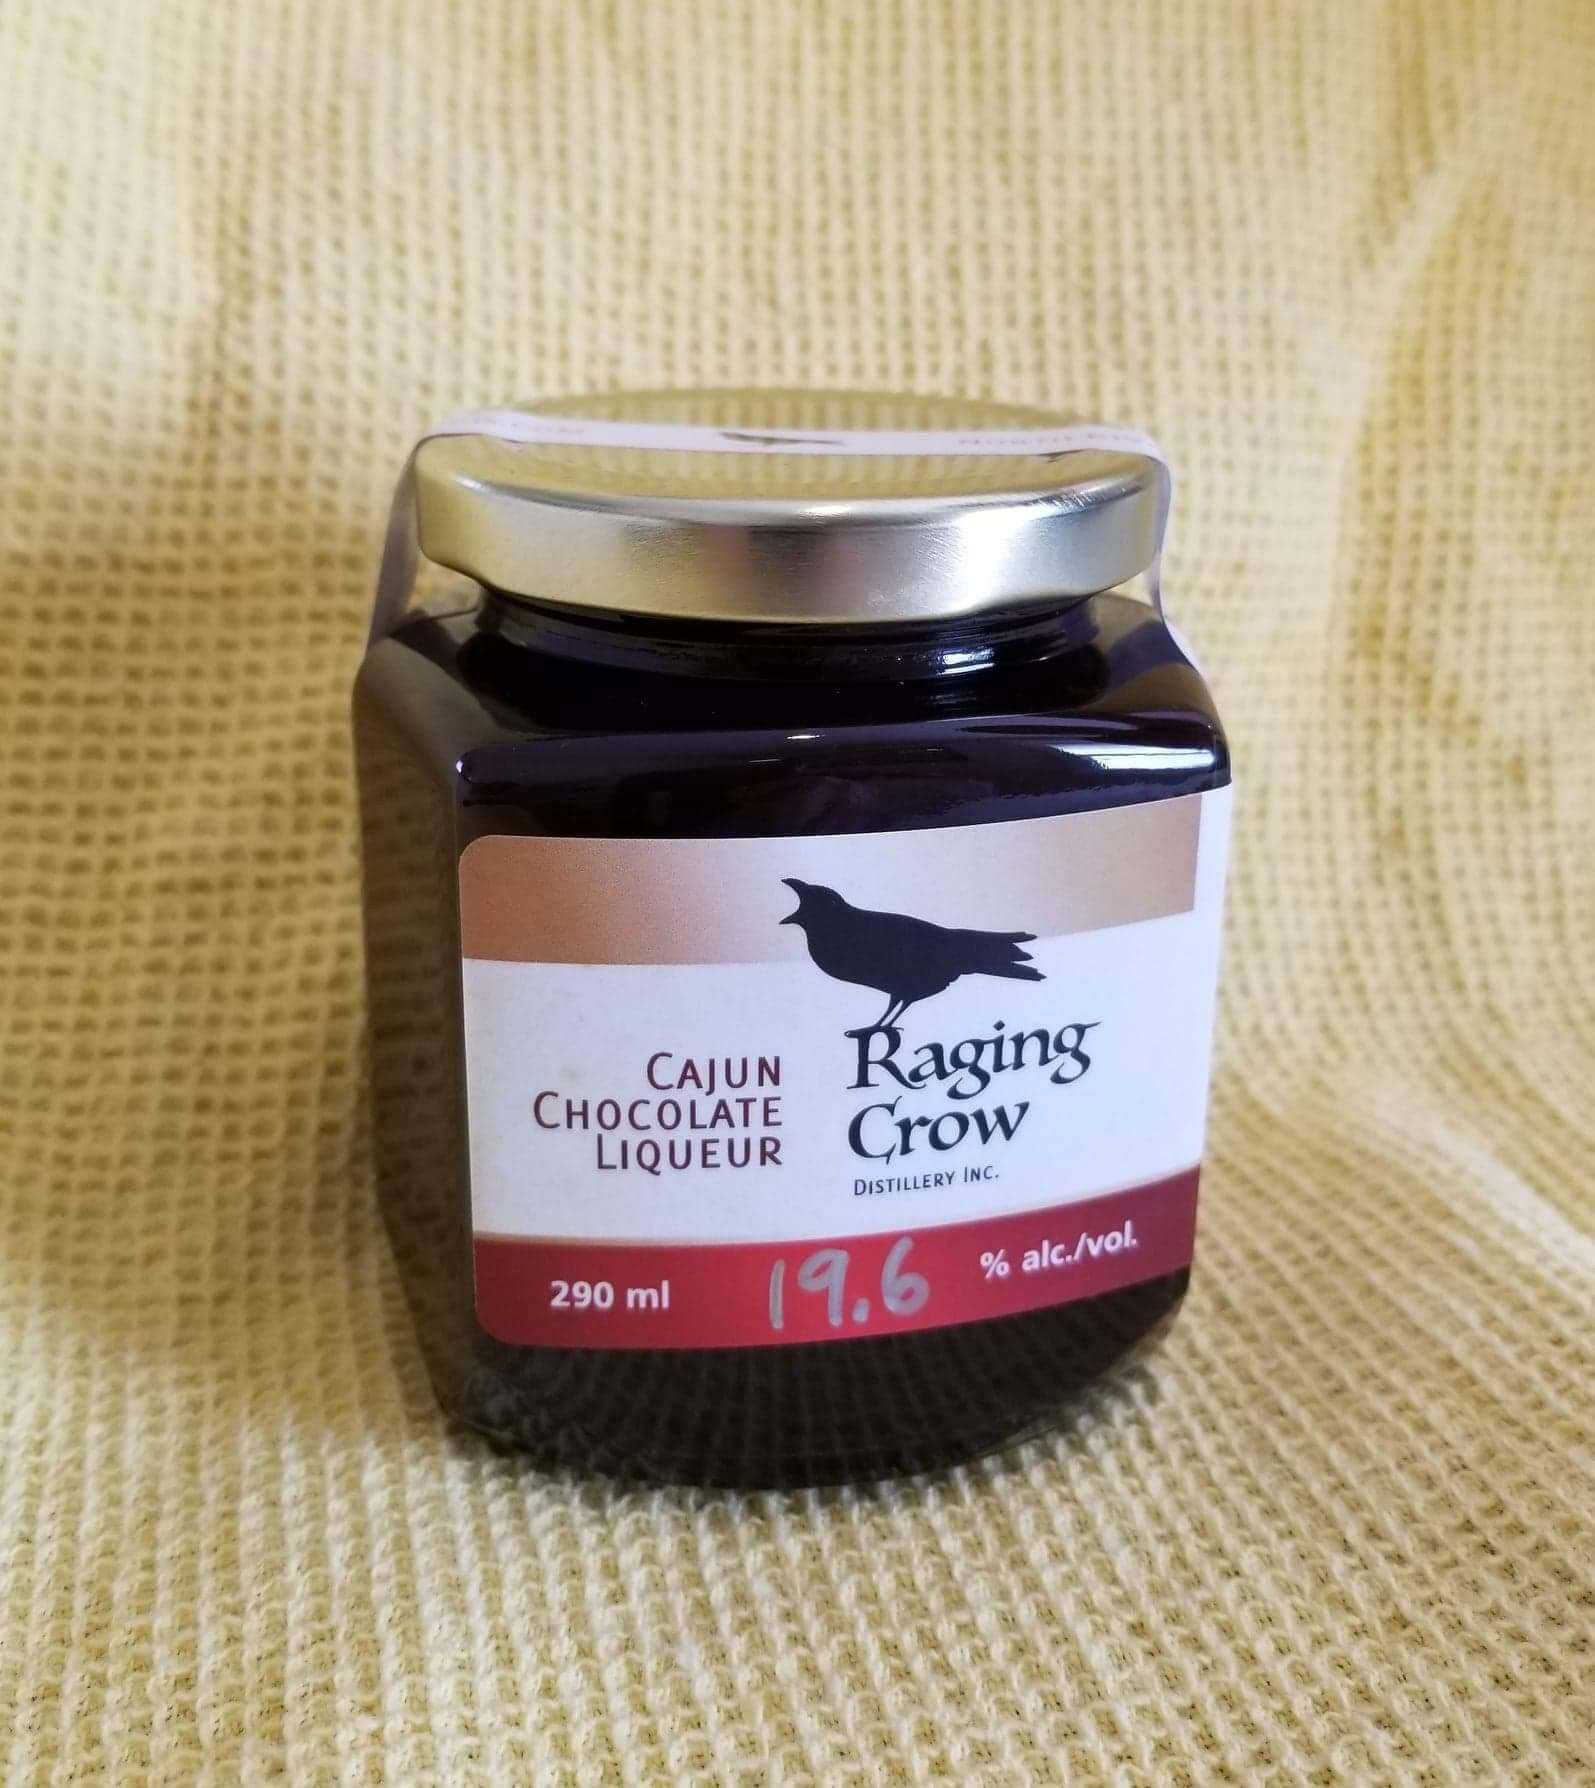 Raging Crow Grown-Up Hot Chocolate - 1 290ml jar of Raging Crow Cajun Chocolate Liqueur1 litre of milkHeat & enjoy!